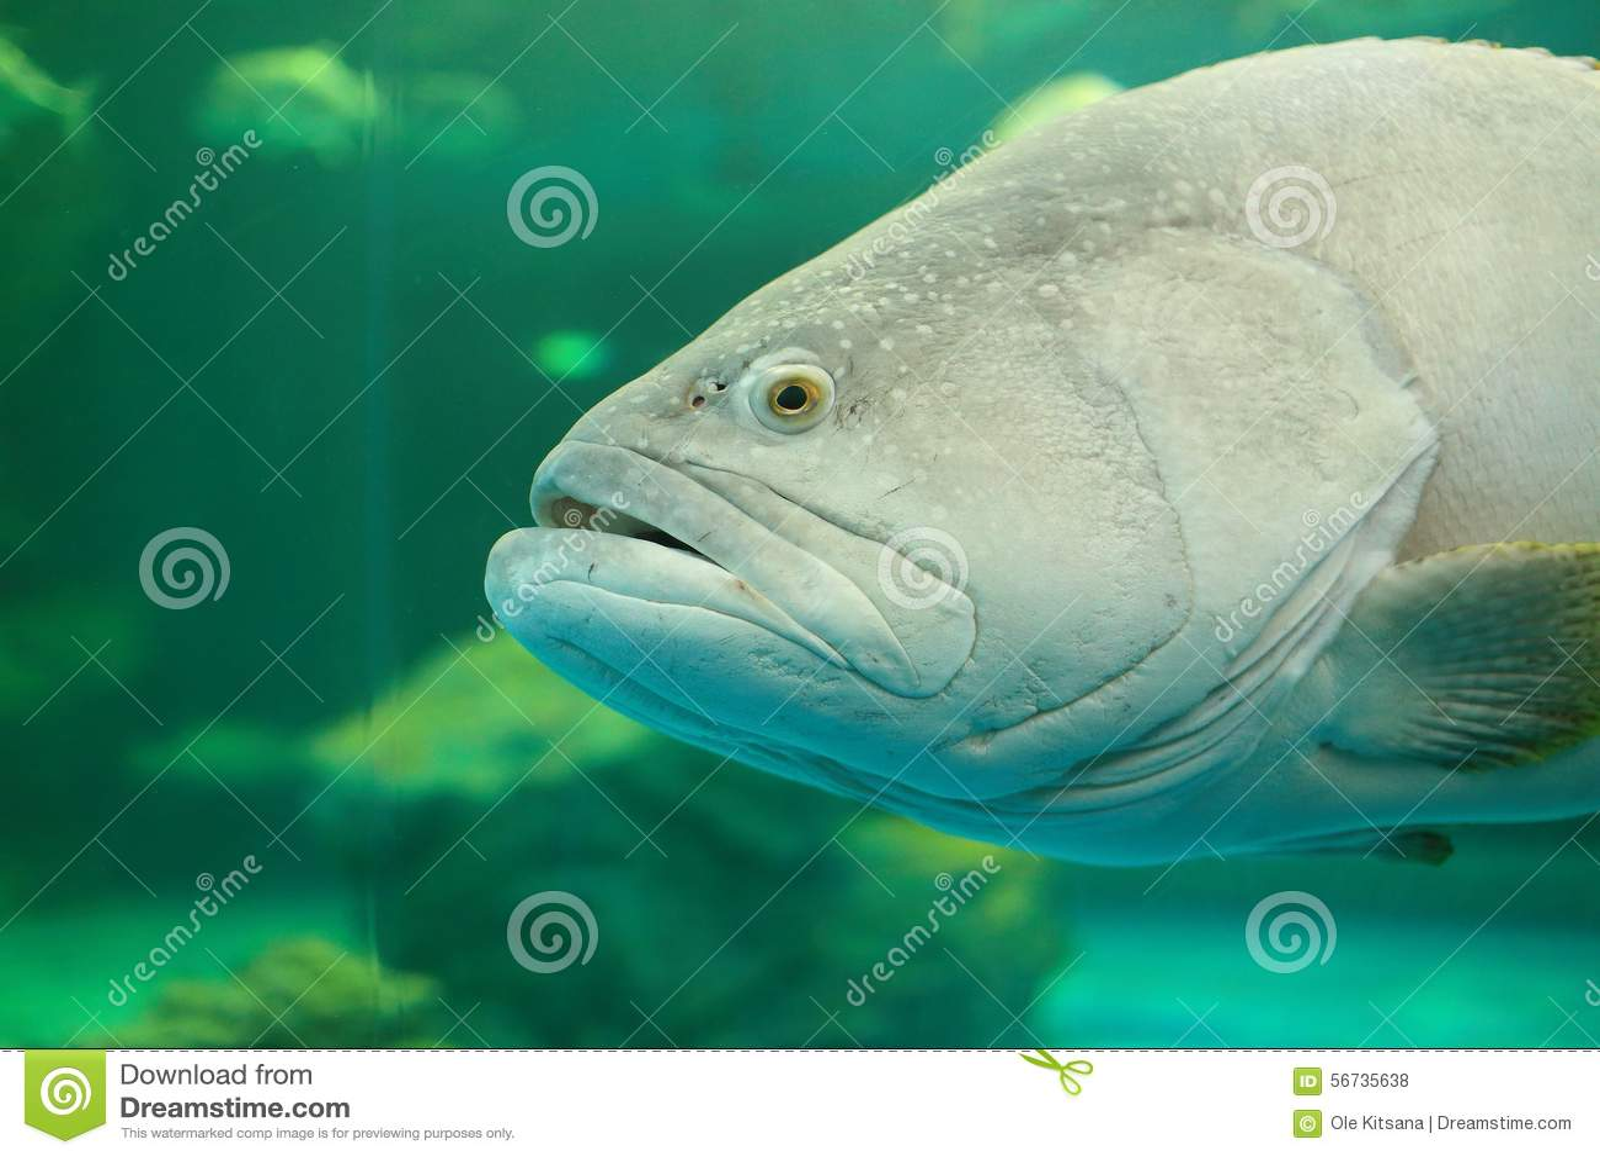 Atlantic Goliath Grouper Stock Photo Image Of Swamps 56735638